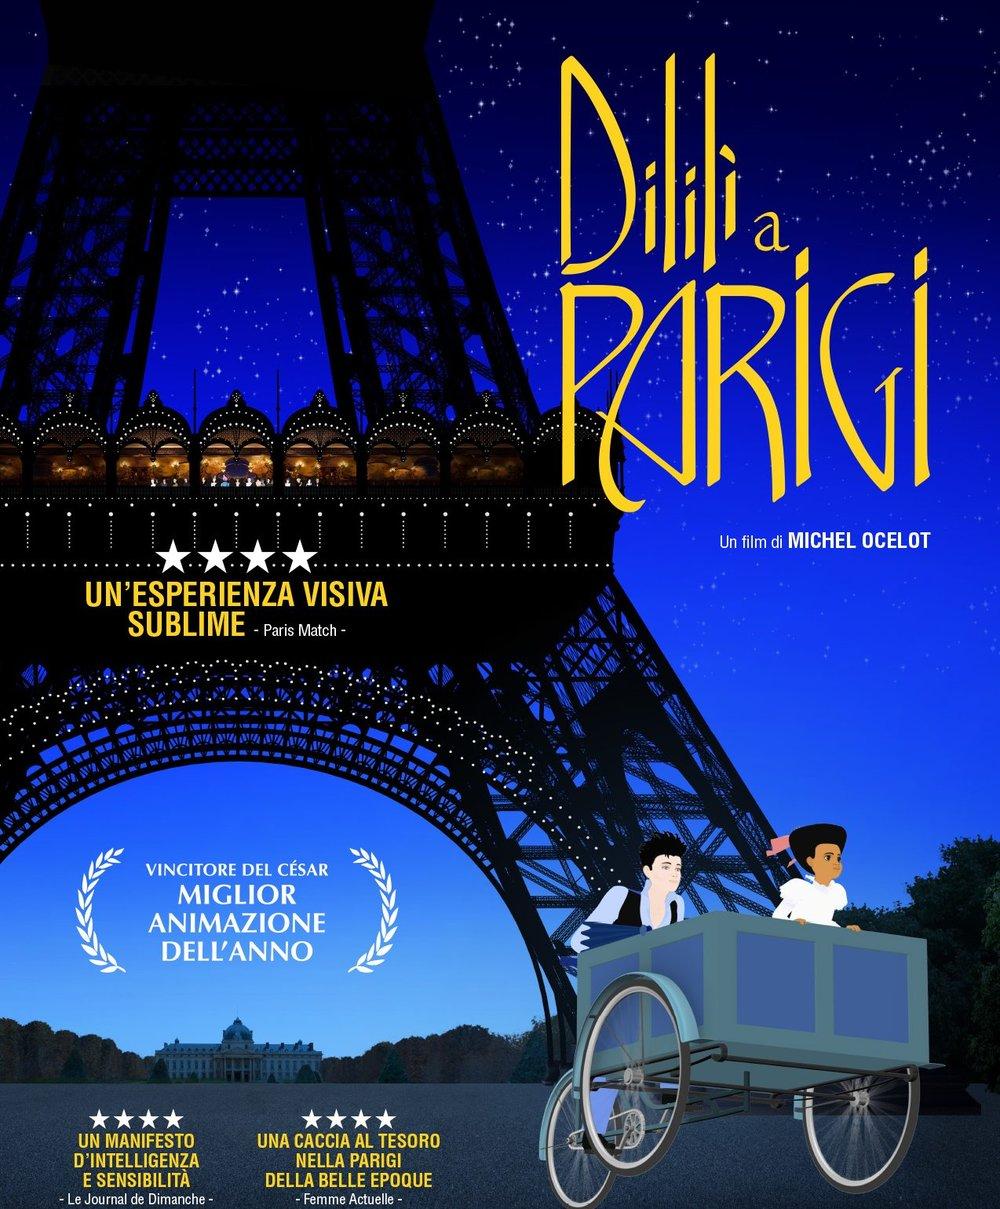 dilili-poster-ita-e1554812226269.jpg